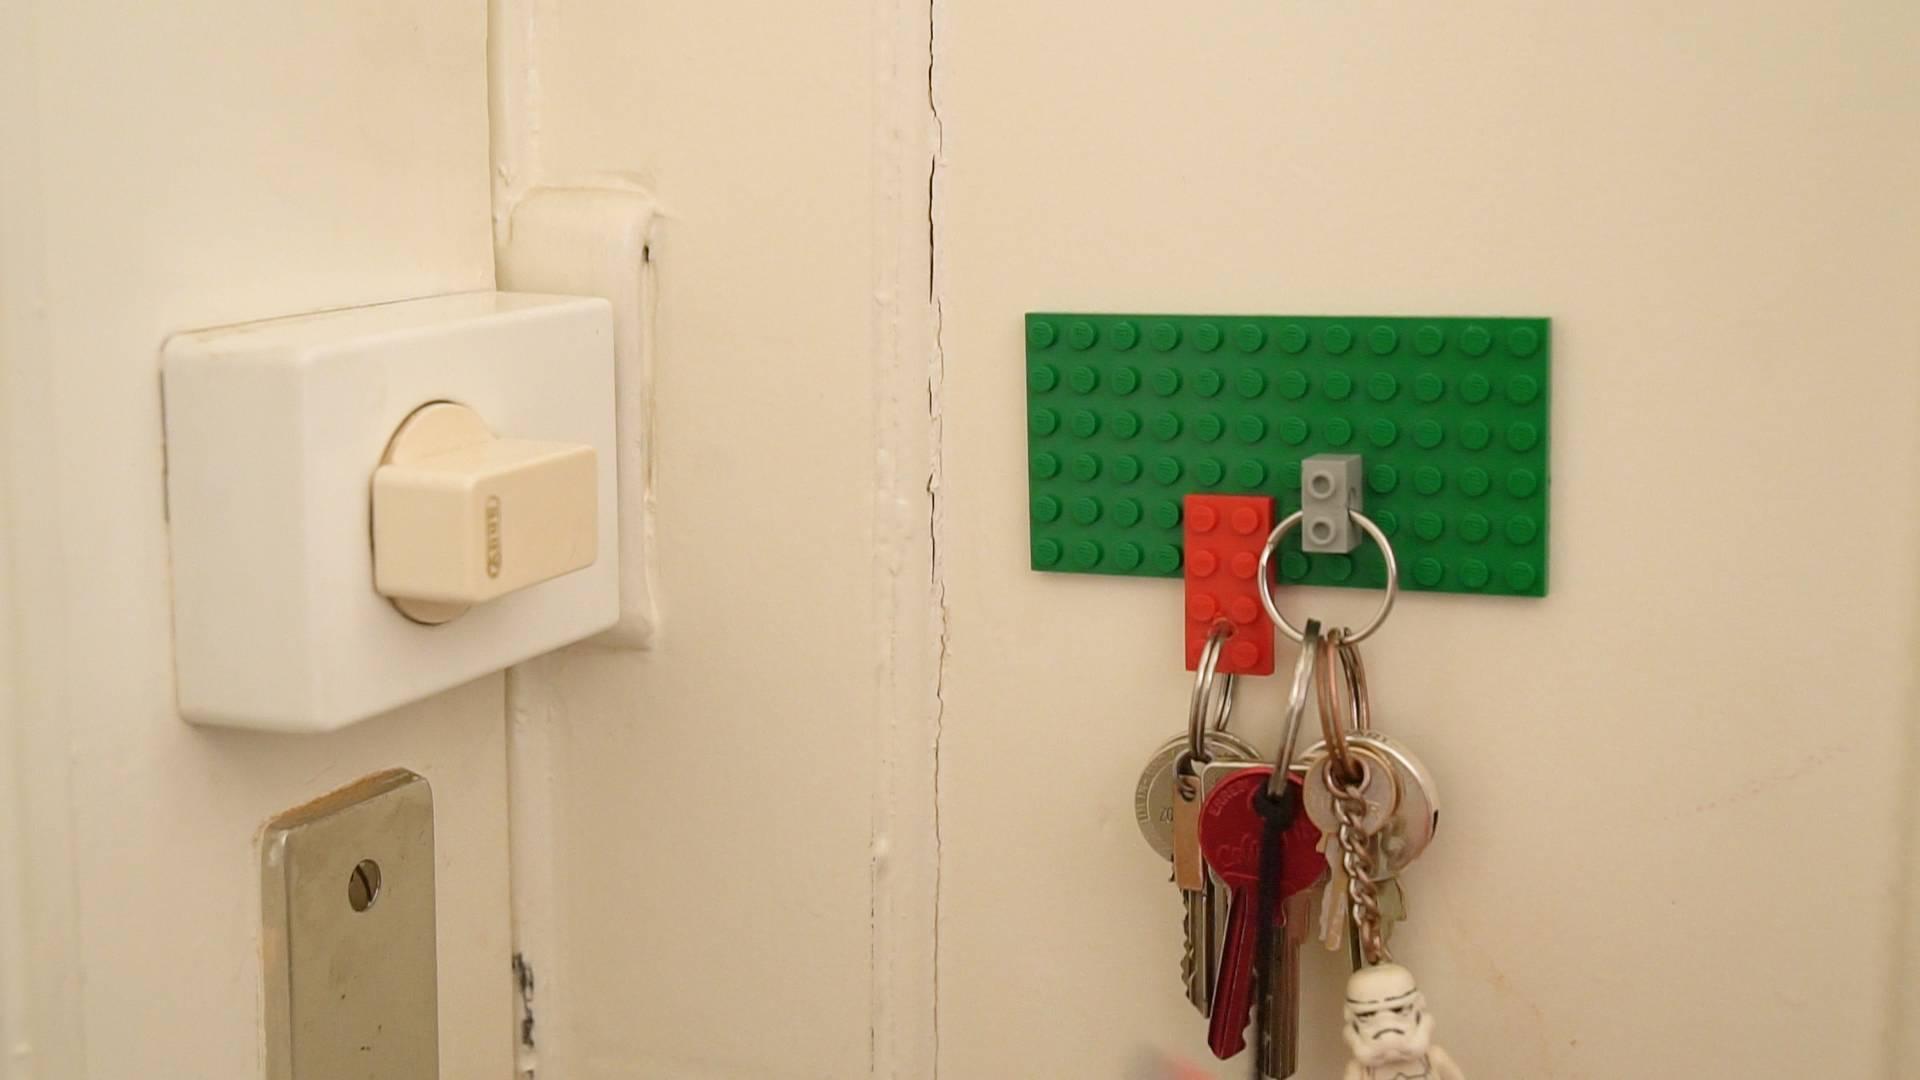 Lego Schlusselhalter Selbst Basteln Techbook